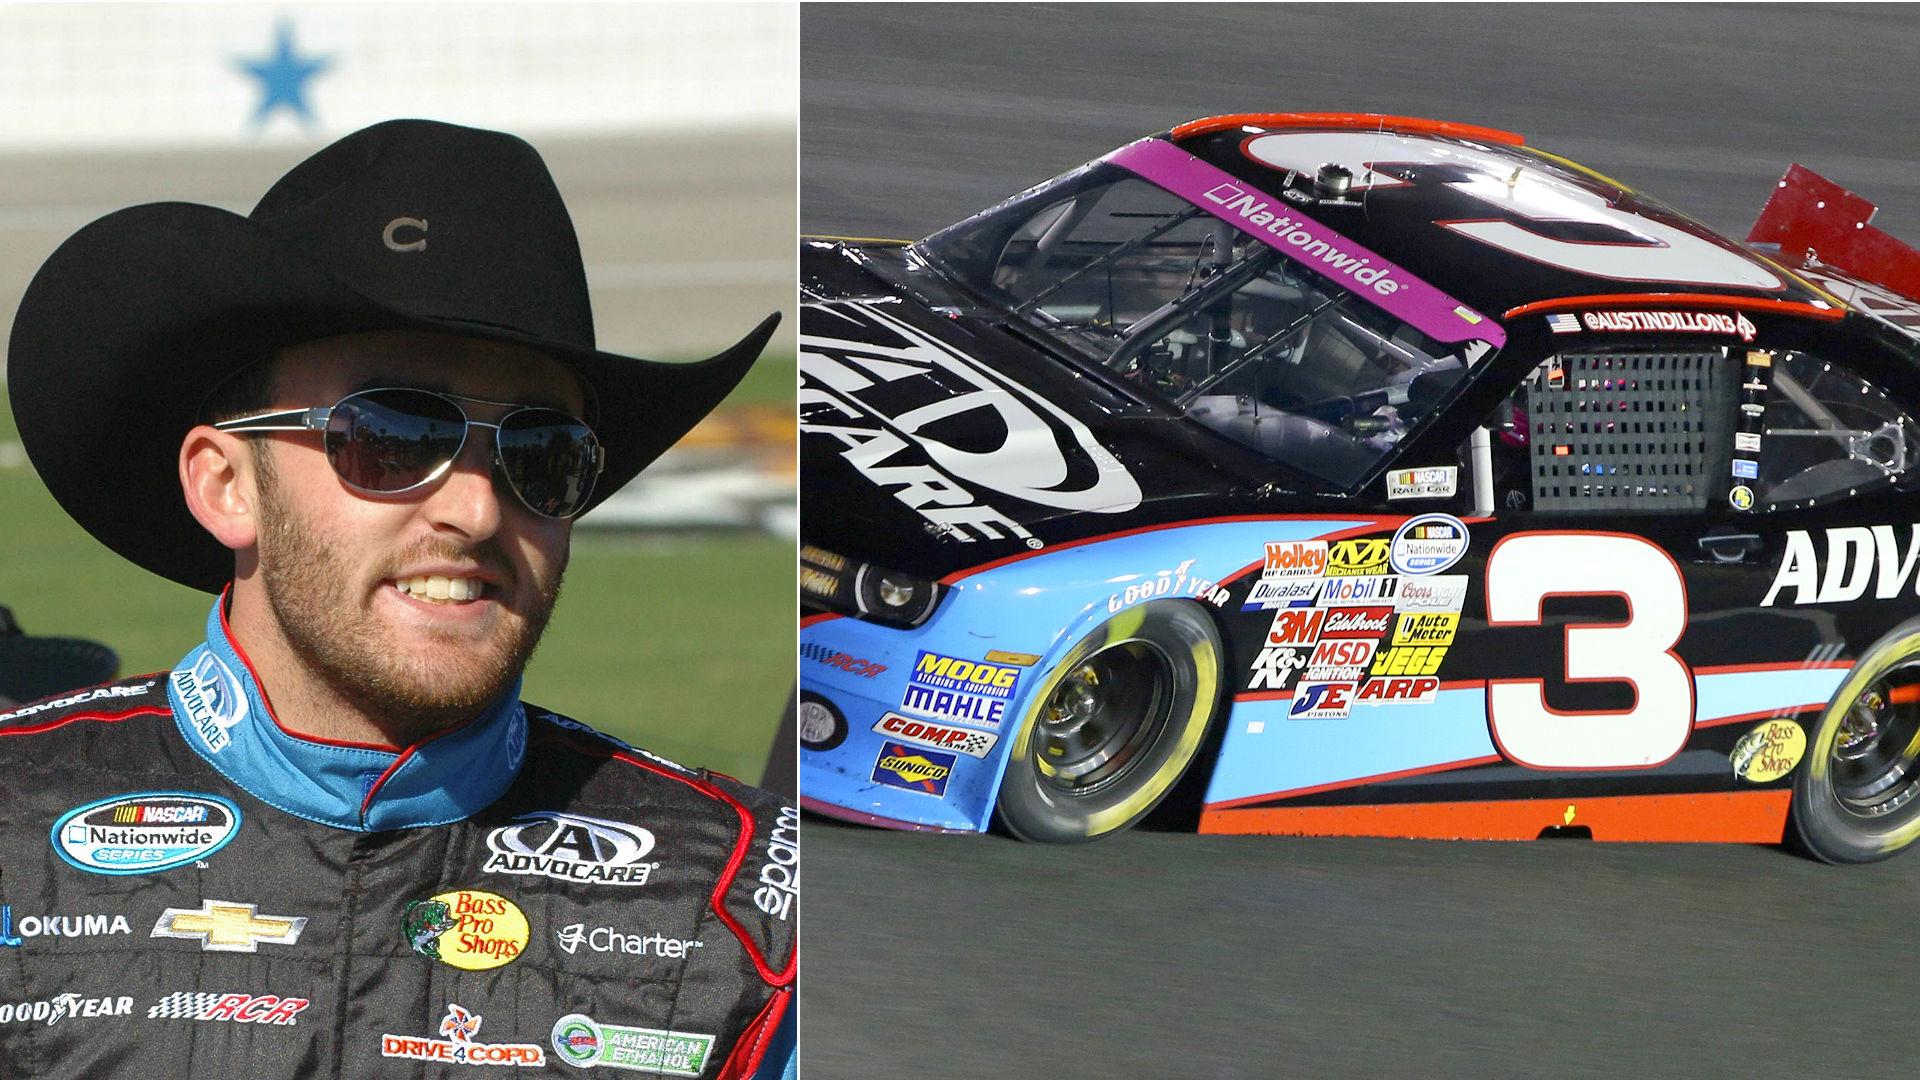 Austin Dillon and the No. 3 car